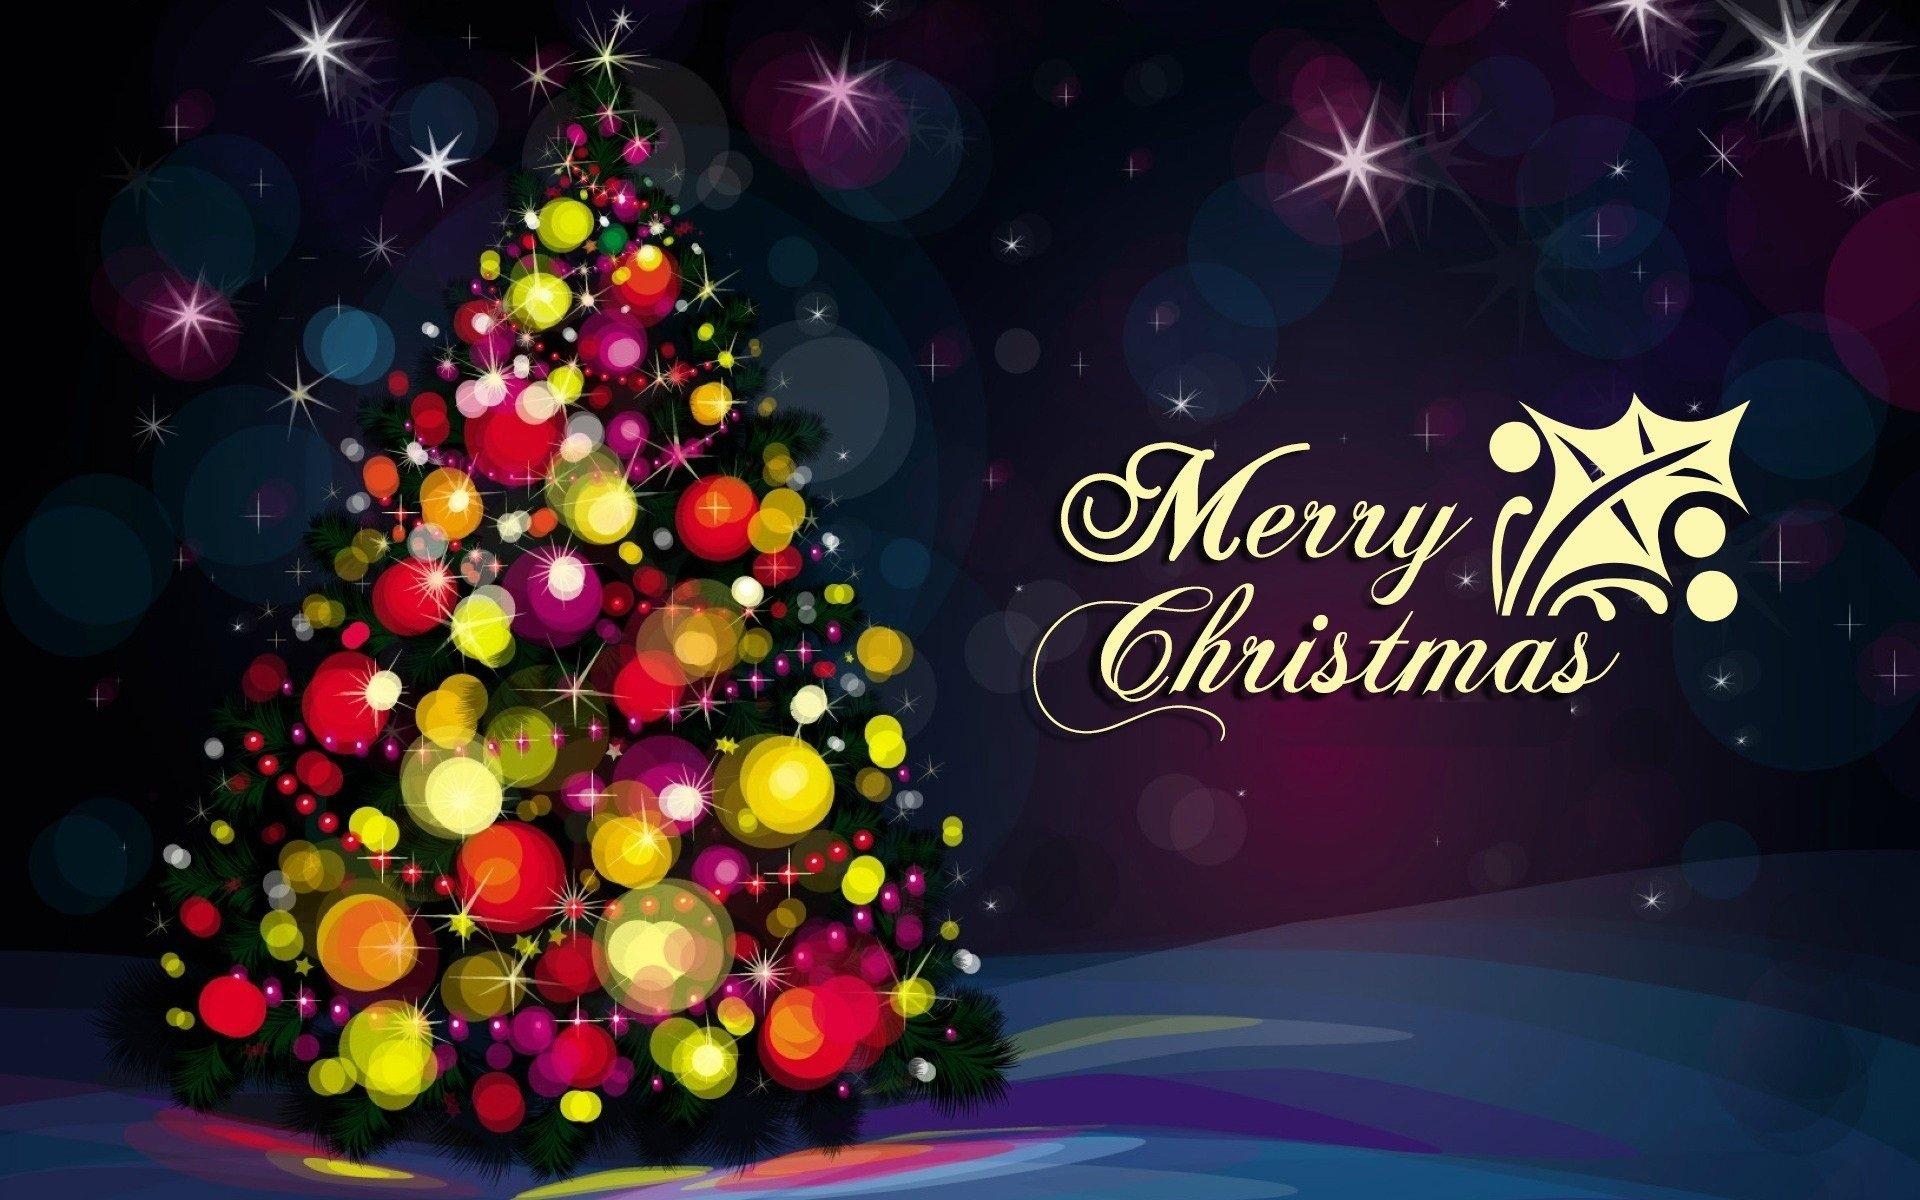 Christmas wallpaper hd – Christmas Wishes Greetings And Jokes